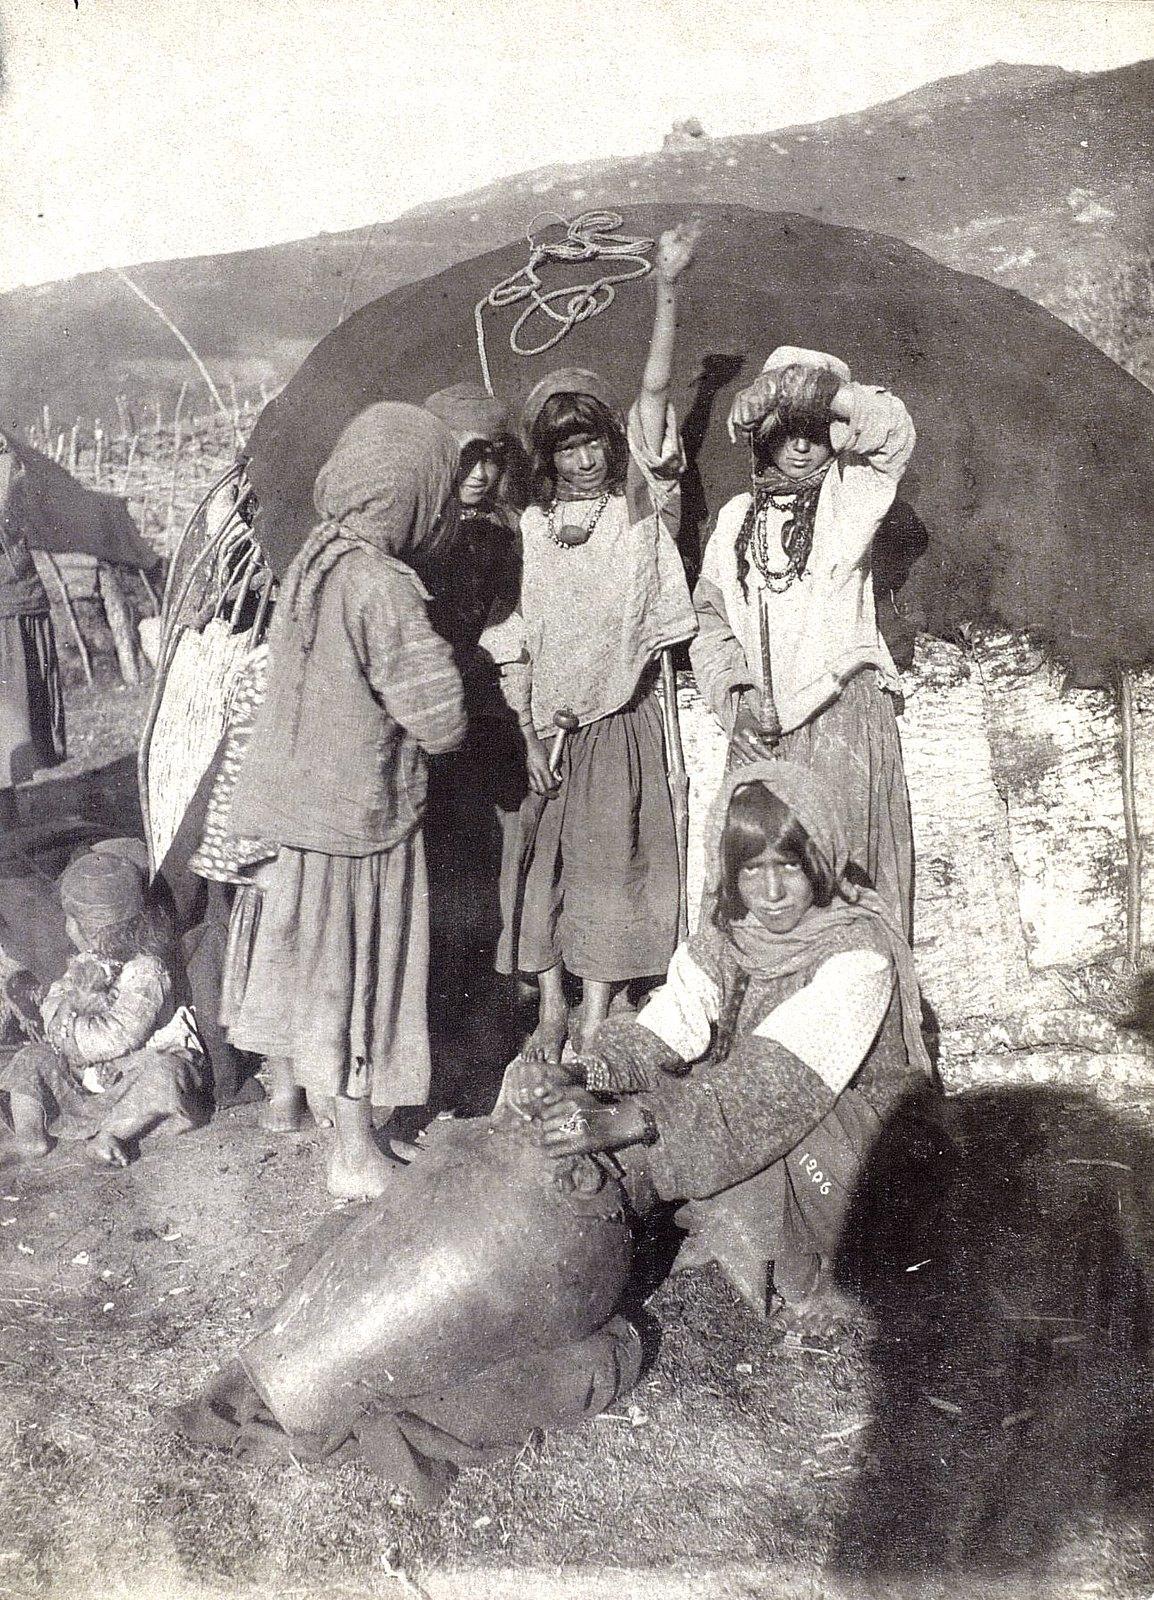 Девочки-лурки возле своего кочевого жилища. Провинция Луристан